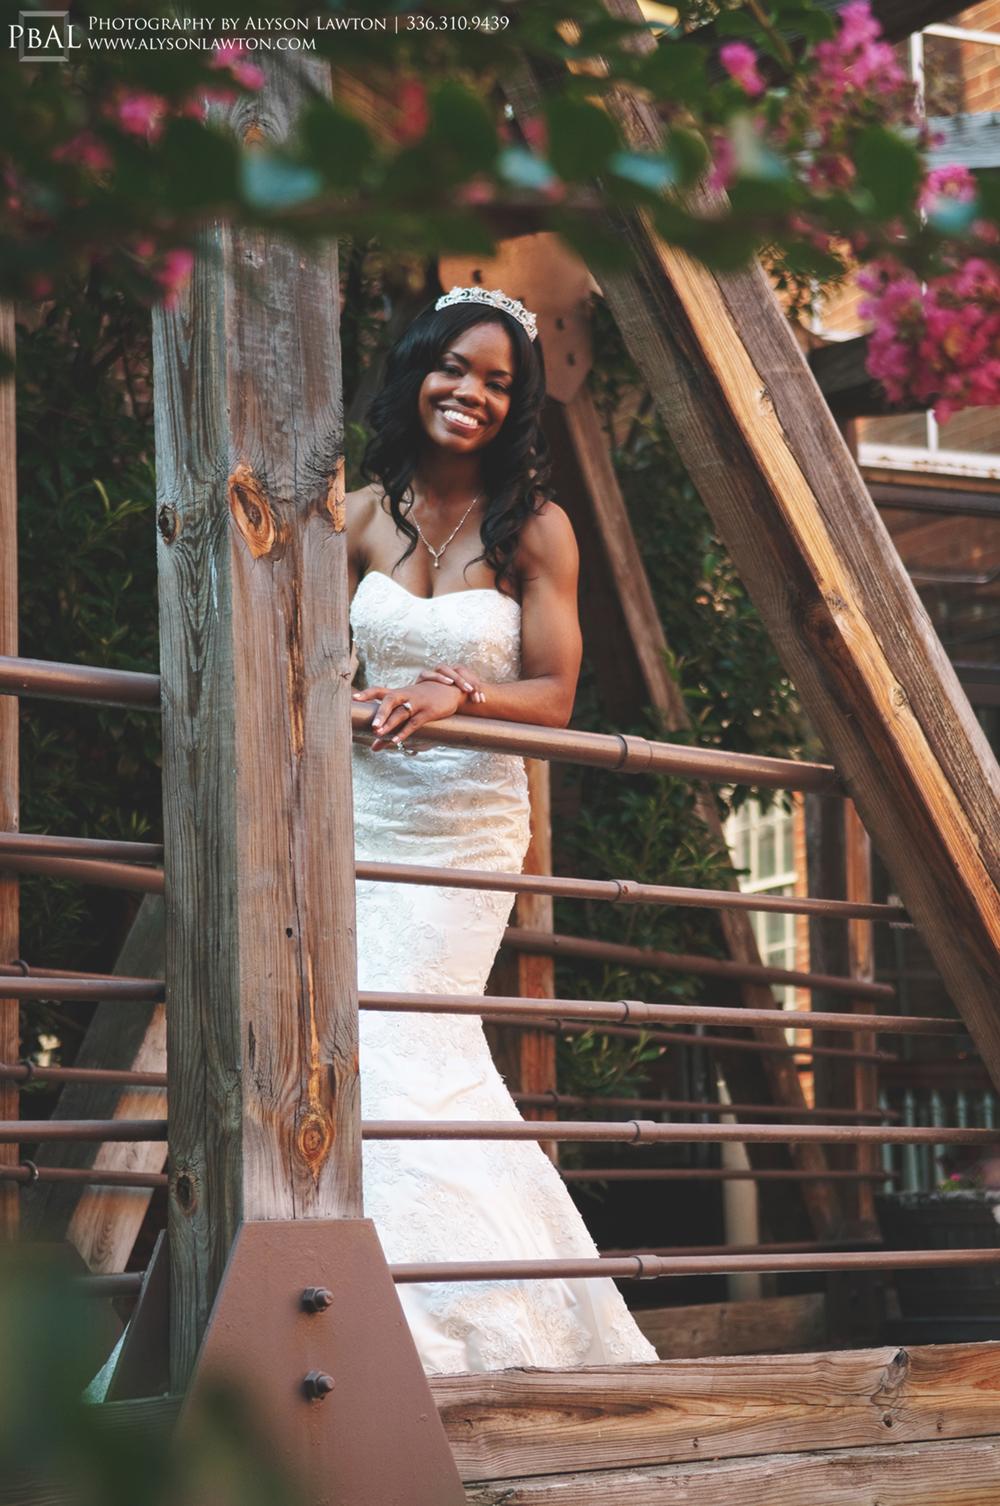 { North Carolina Portrait Photographer | Winston Salem | Jessica's Bridal Portraits | Photography by Alyson Lawton }